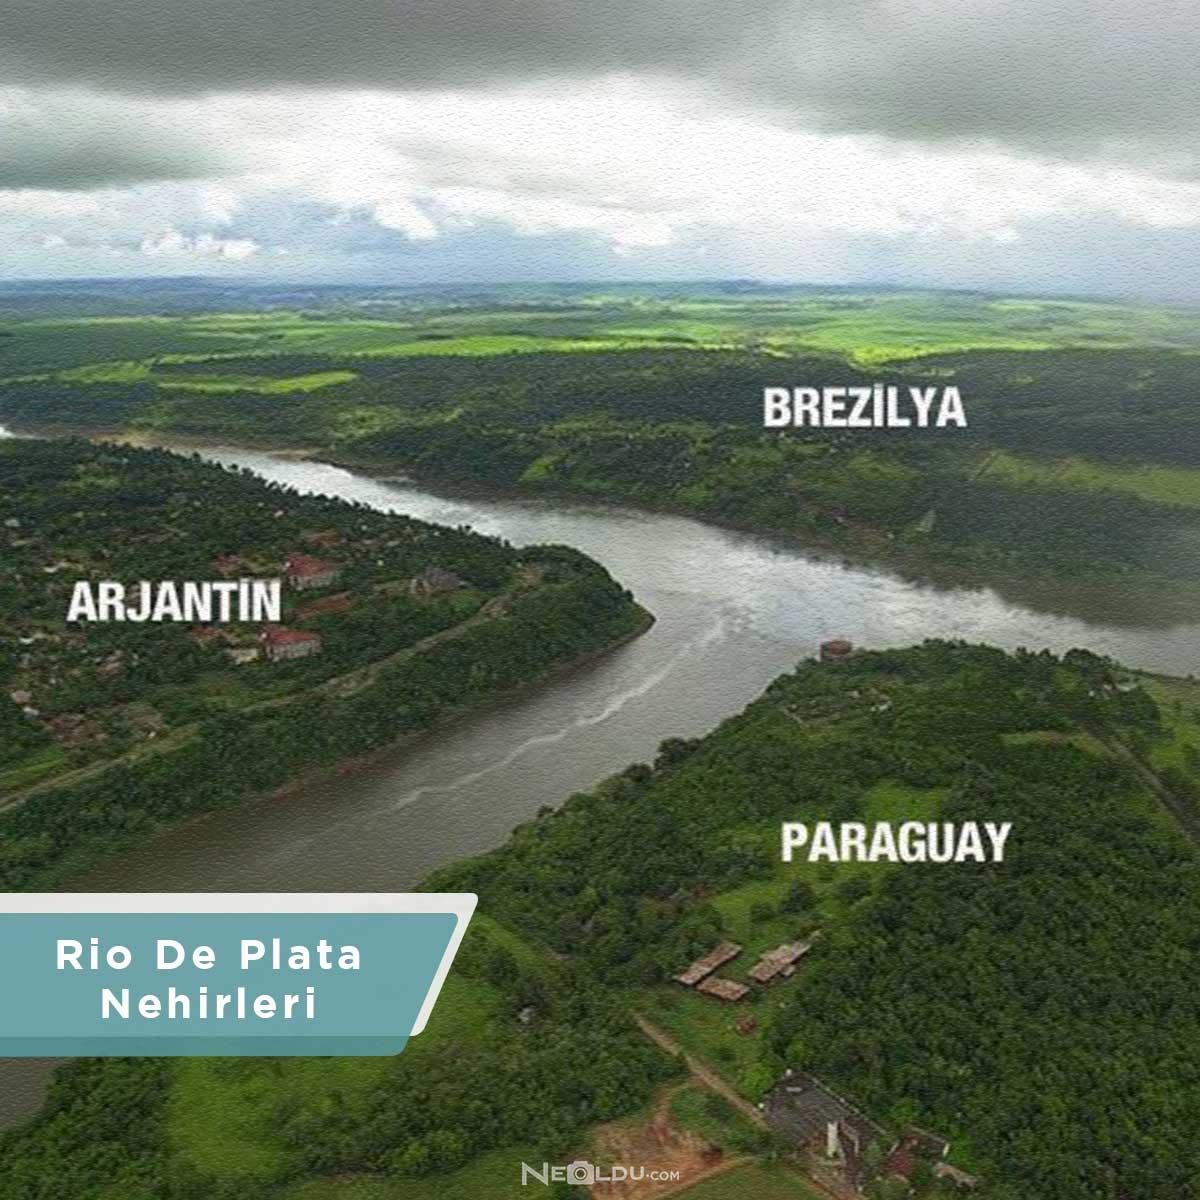 rio-de-plata-nehirleri-001.jpg